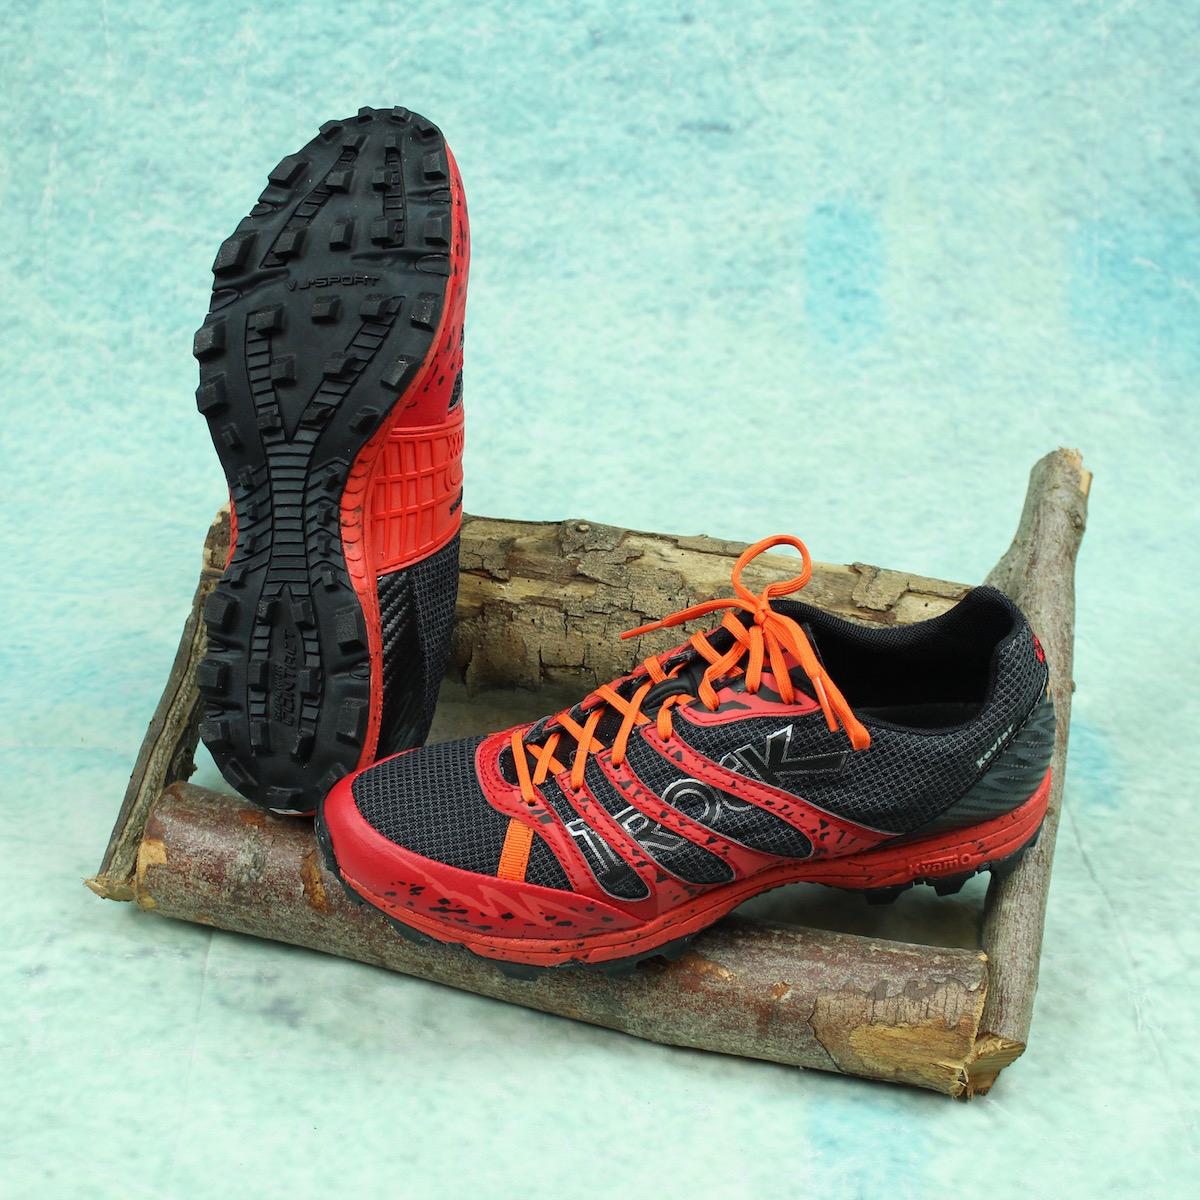 Footwear for Orienteering Fell & Trail running